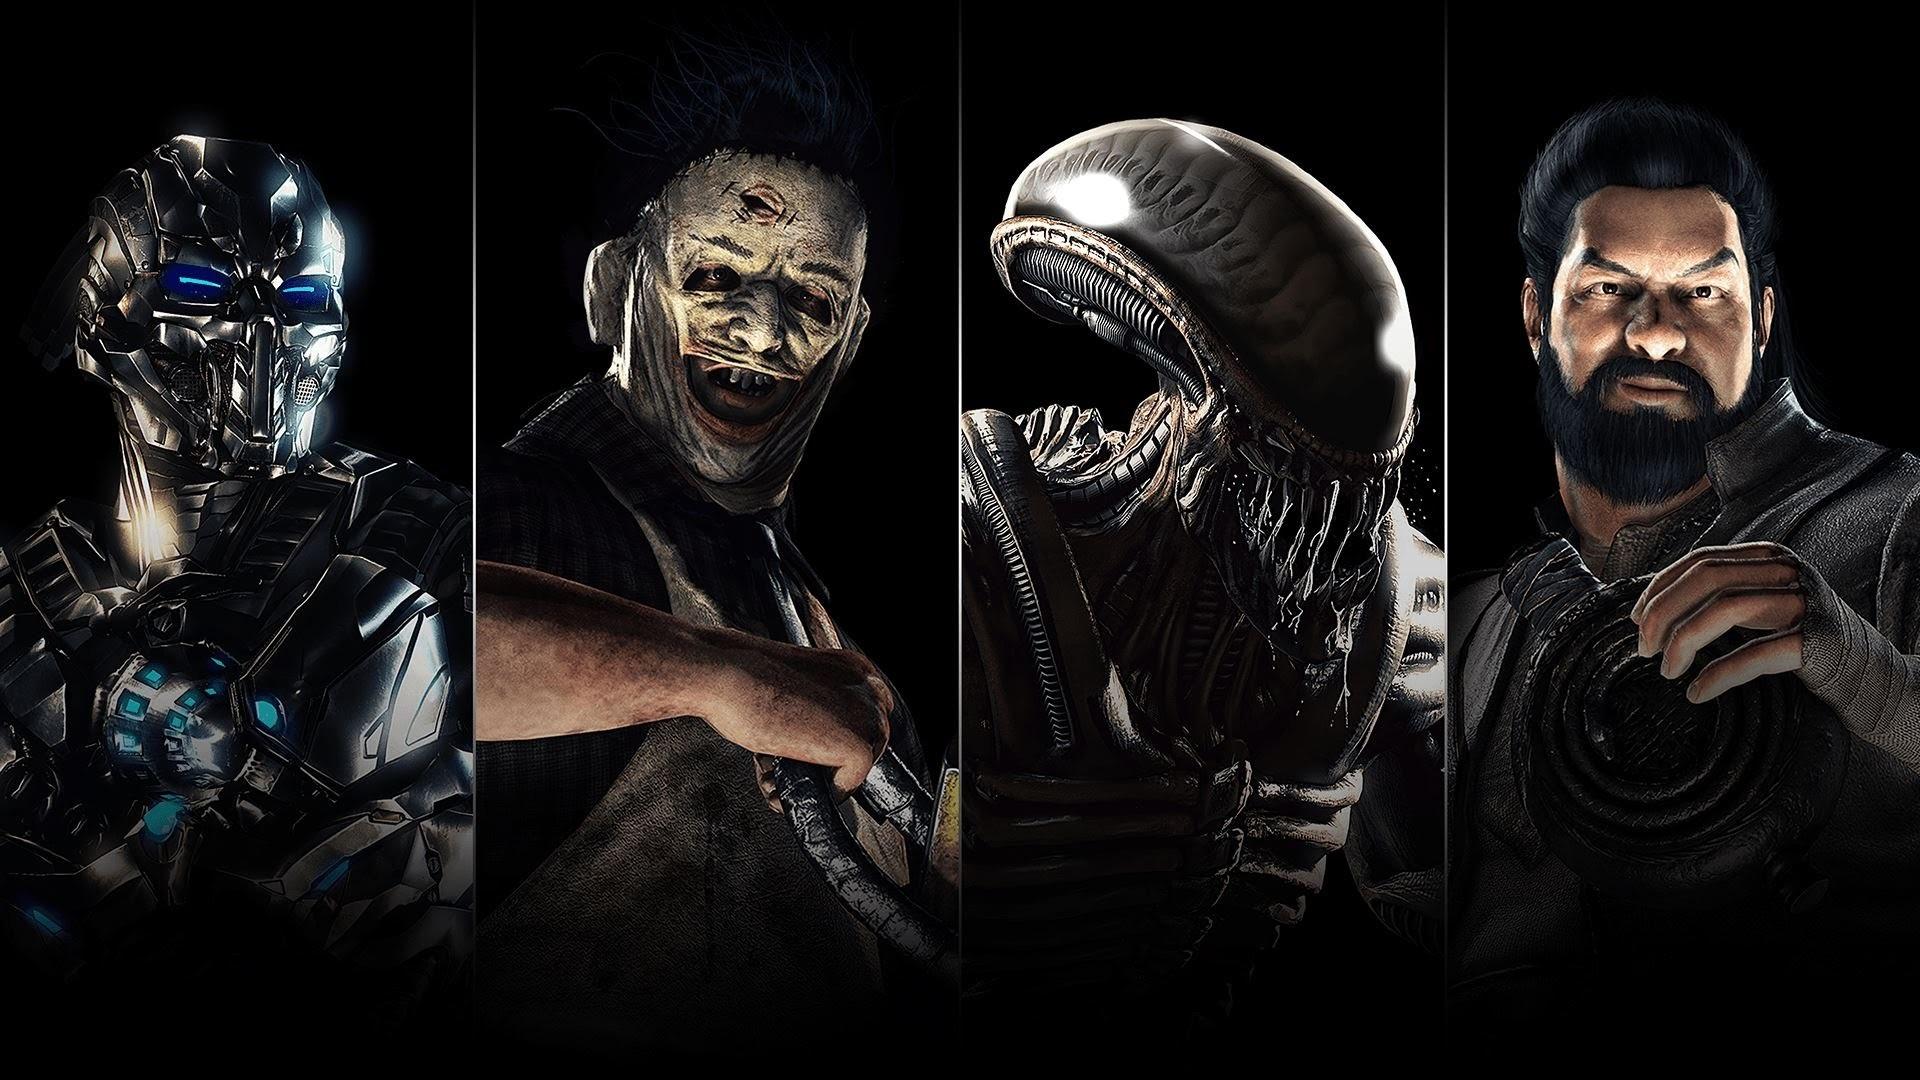 Mortal Kombat:Pack 2 Gameplay(Bo Rai Cho,Triborg,Leatherface,and Alien) –  YouTube